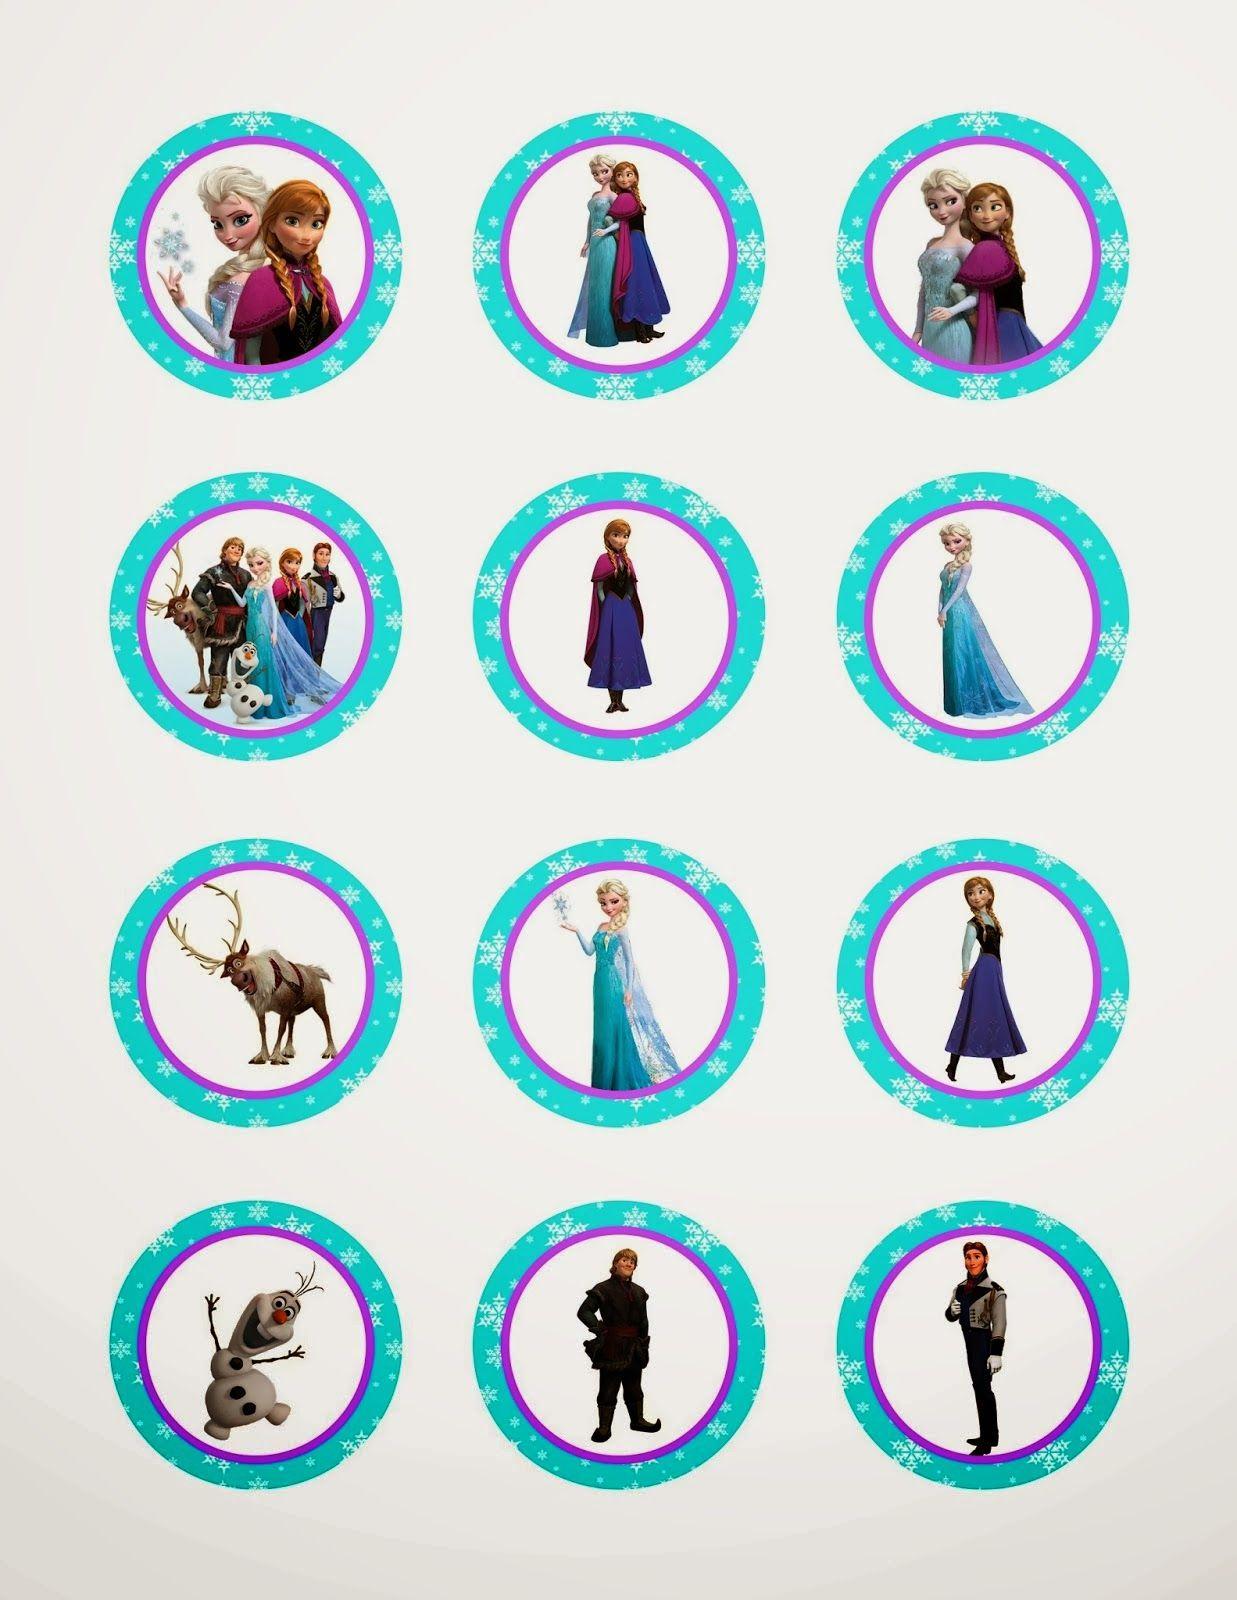 Frozen Cupcake Ideas Frozen: Free Printable Toppers | Birthday - Frozen Cupcake Toppers Free Printable